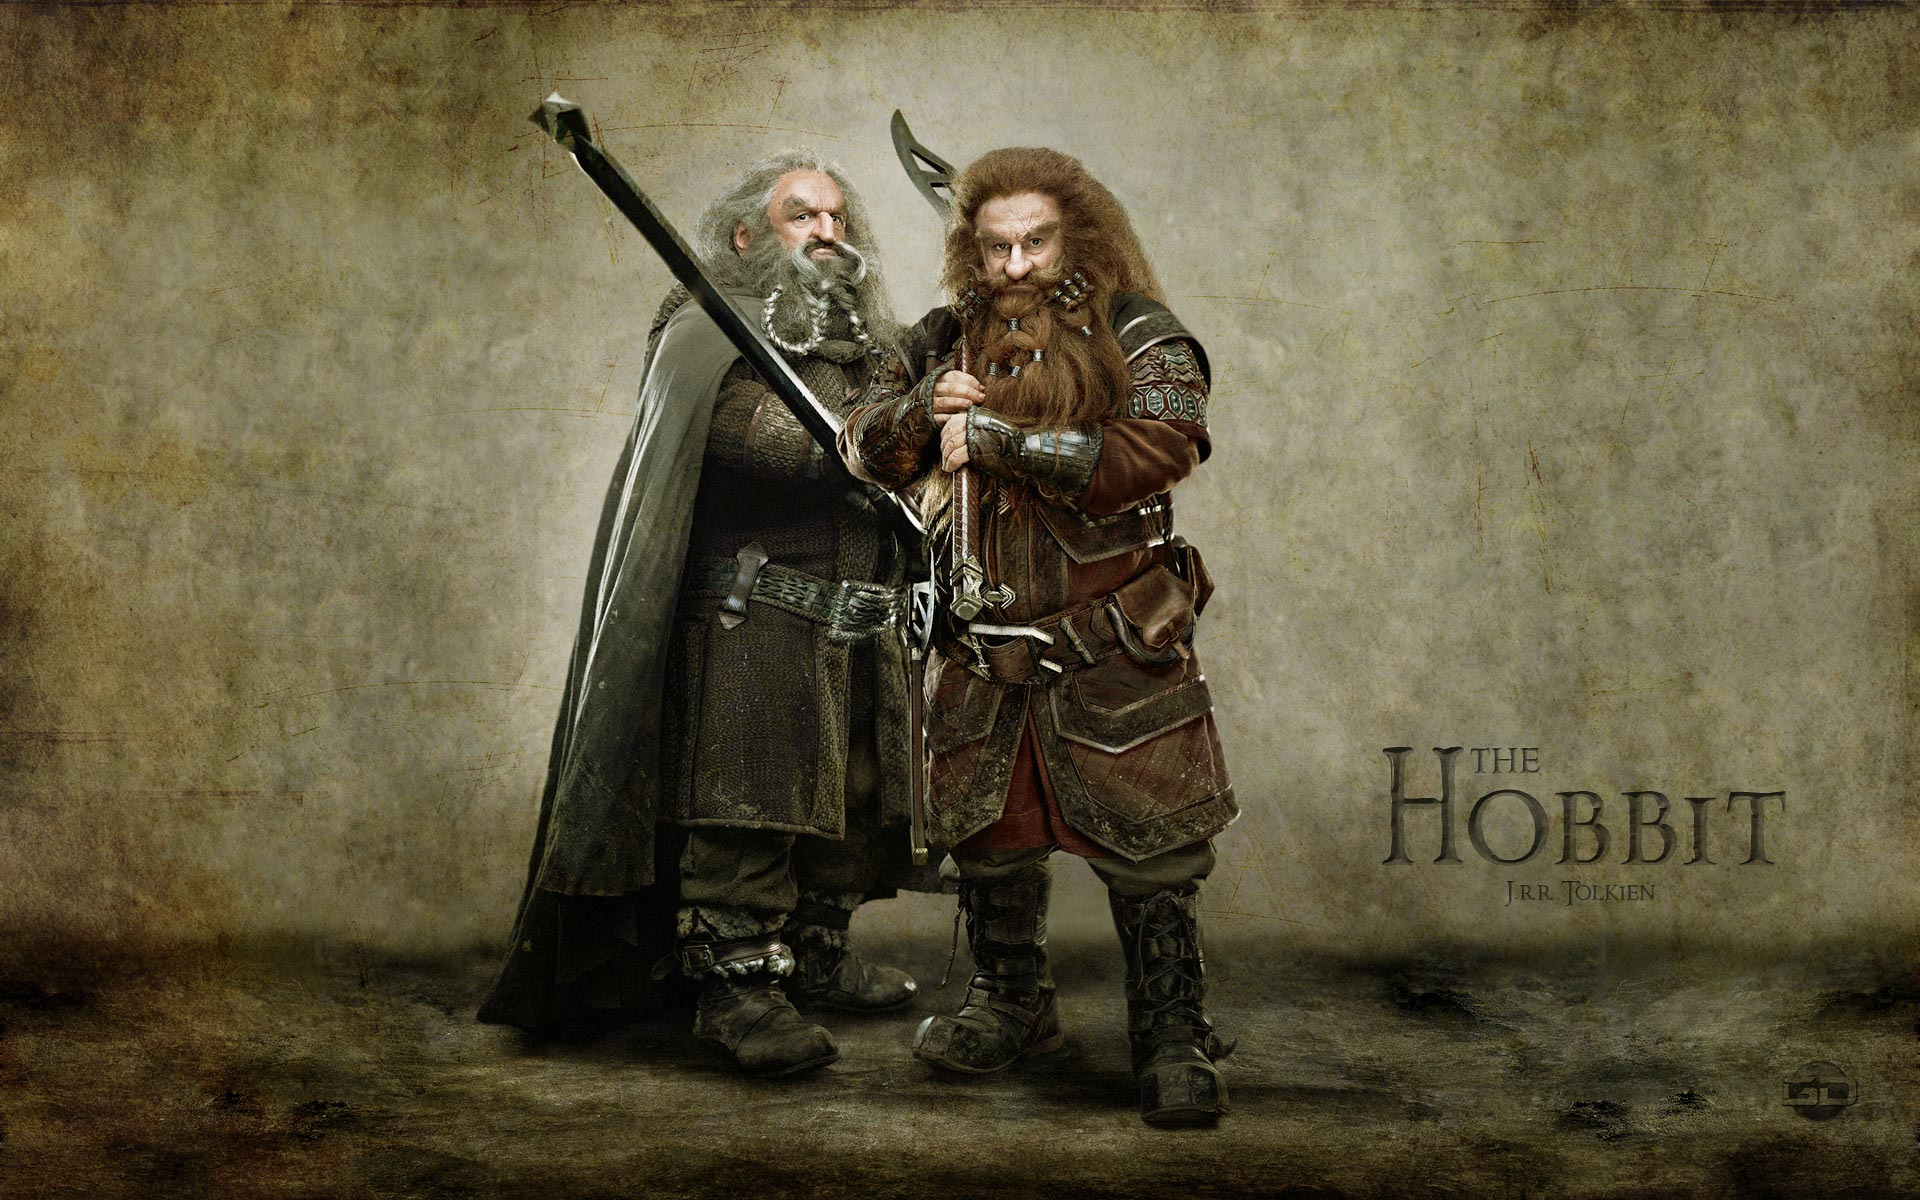 Hobbit Part 1 - An Unexpected Journey